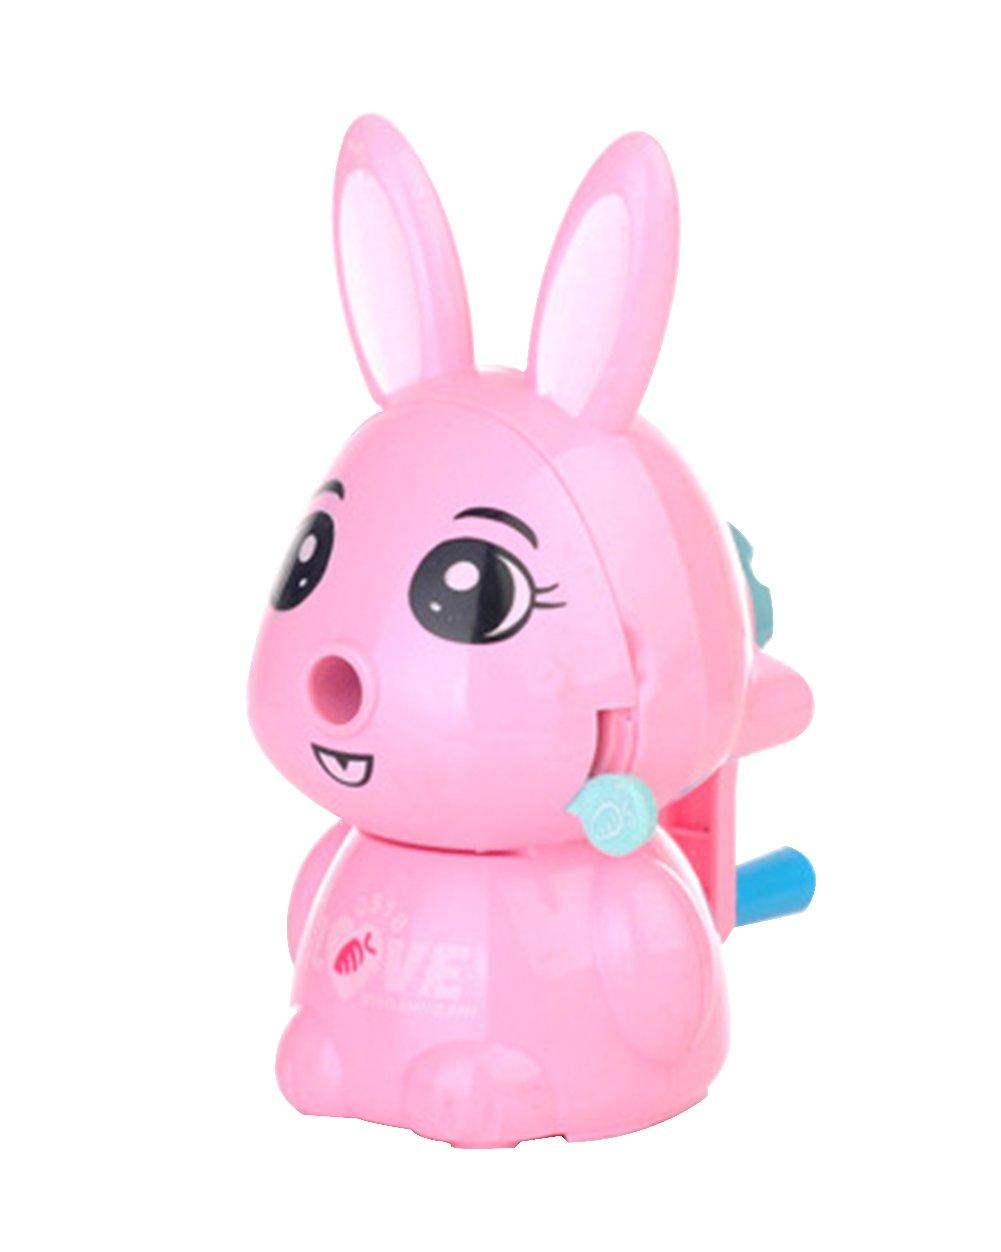 Portable Manual Desktop Stationery-Rabbit Funny Cartoon Animal Hand Crank Pencil Sharpener for Kids